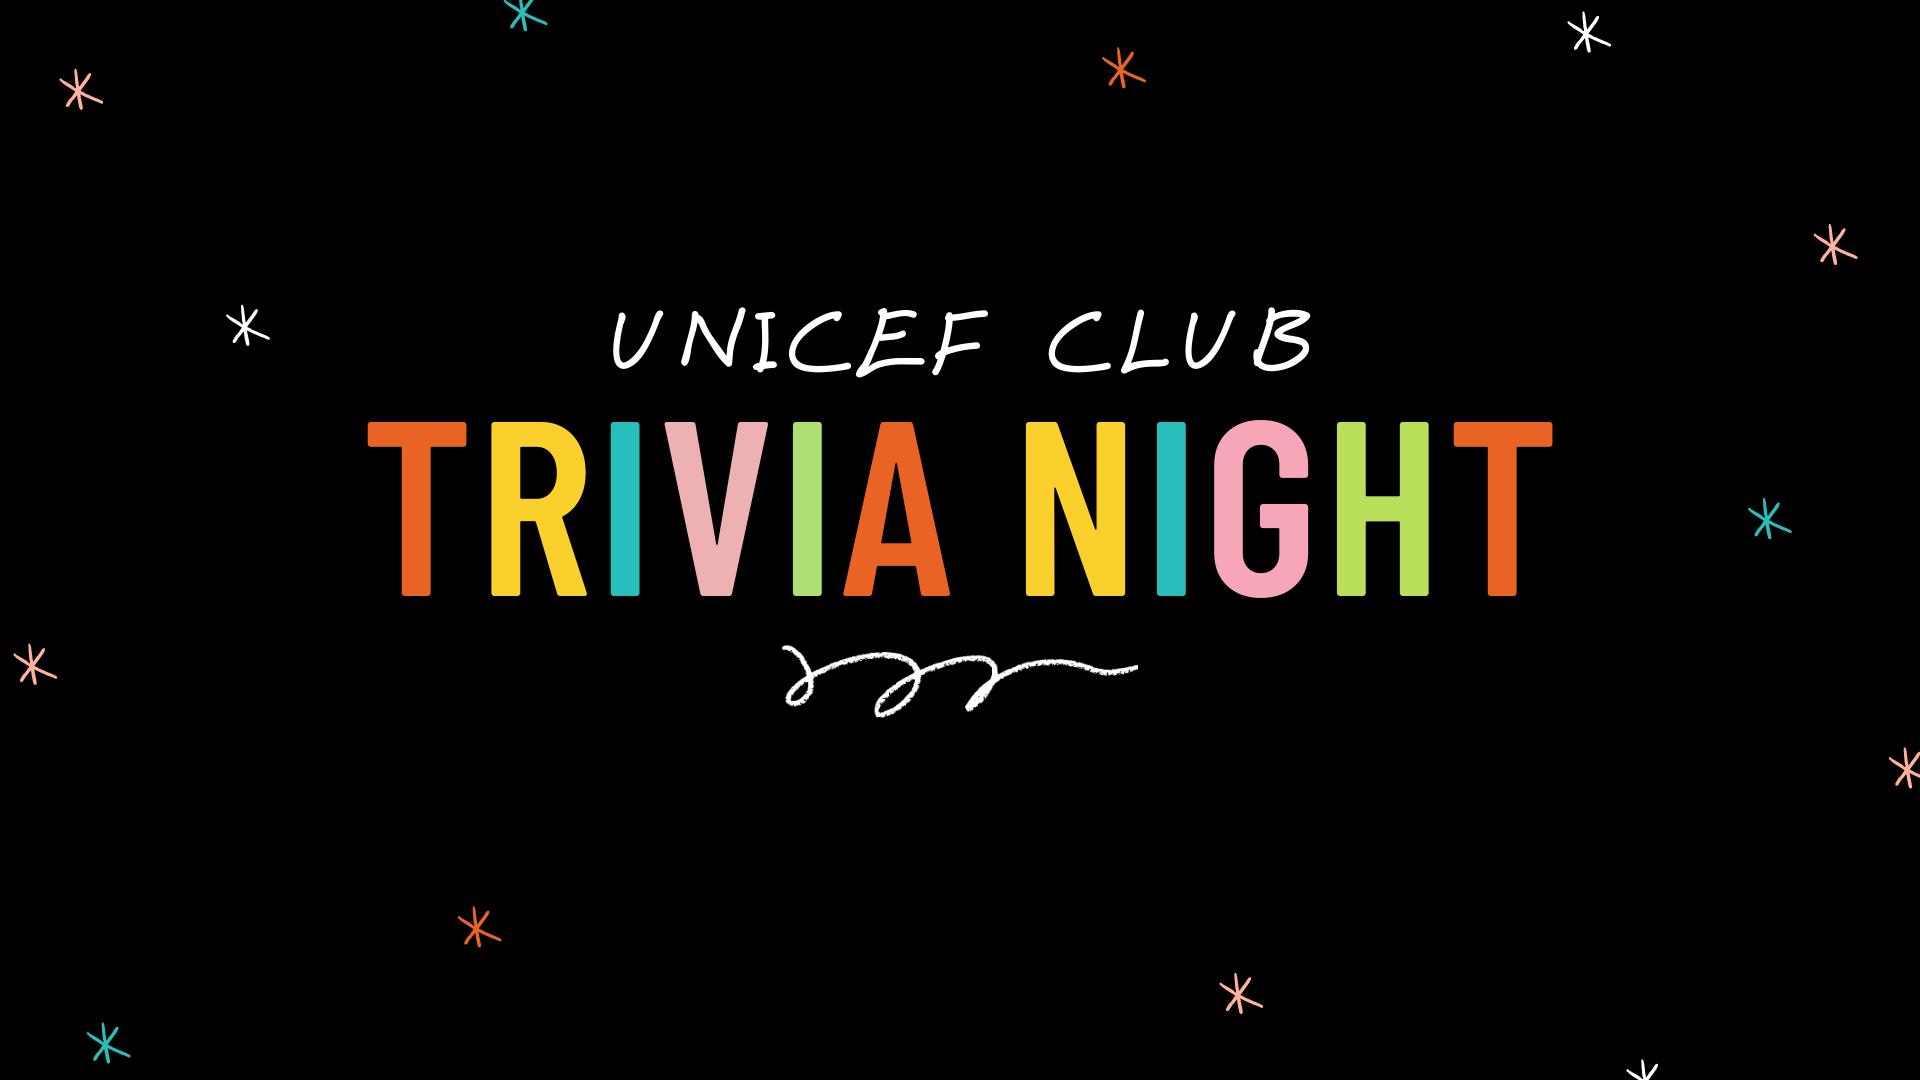 UNICEF Club Trivia Night